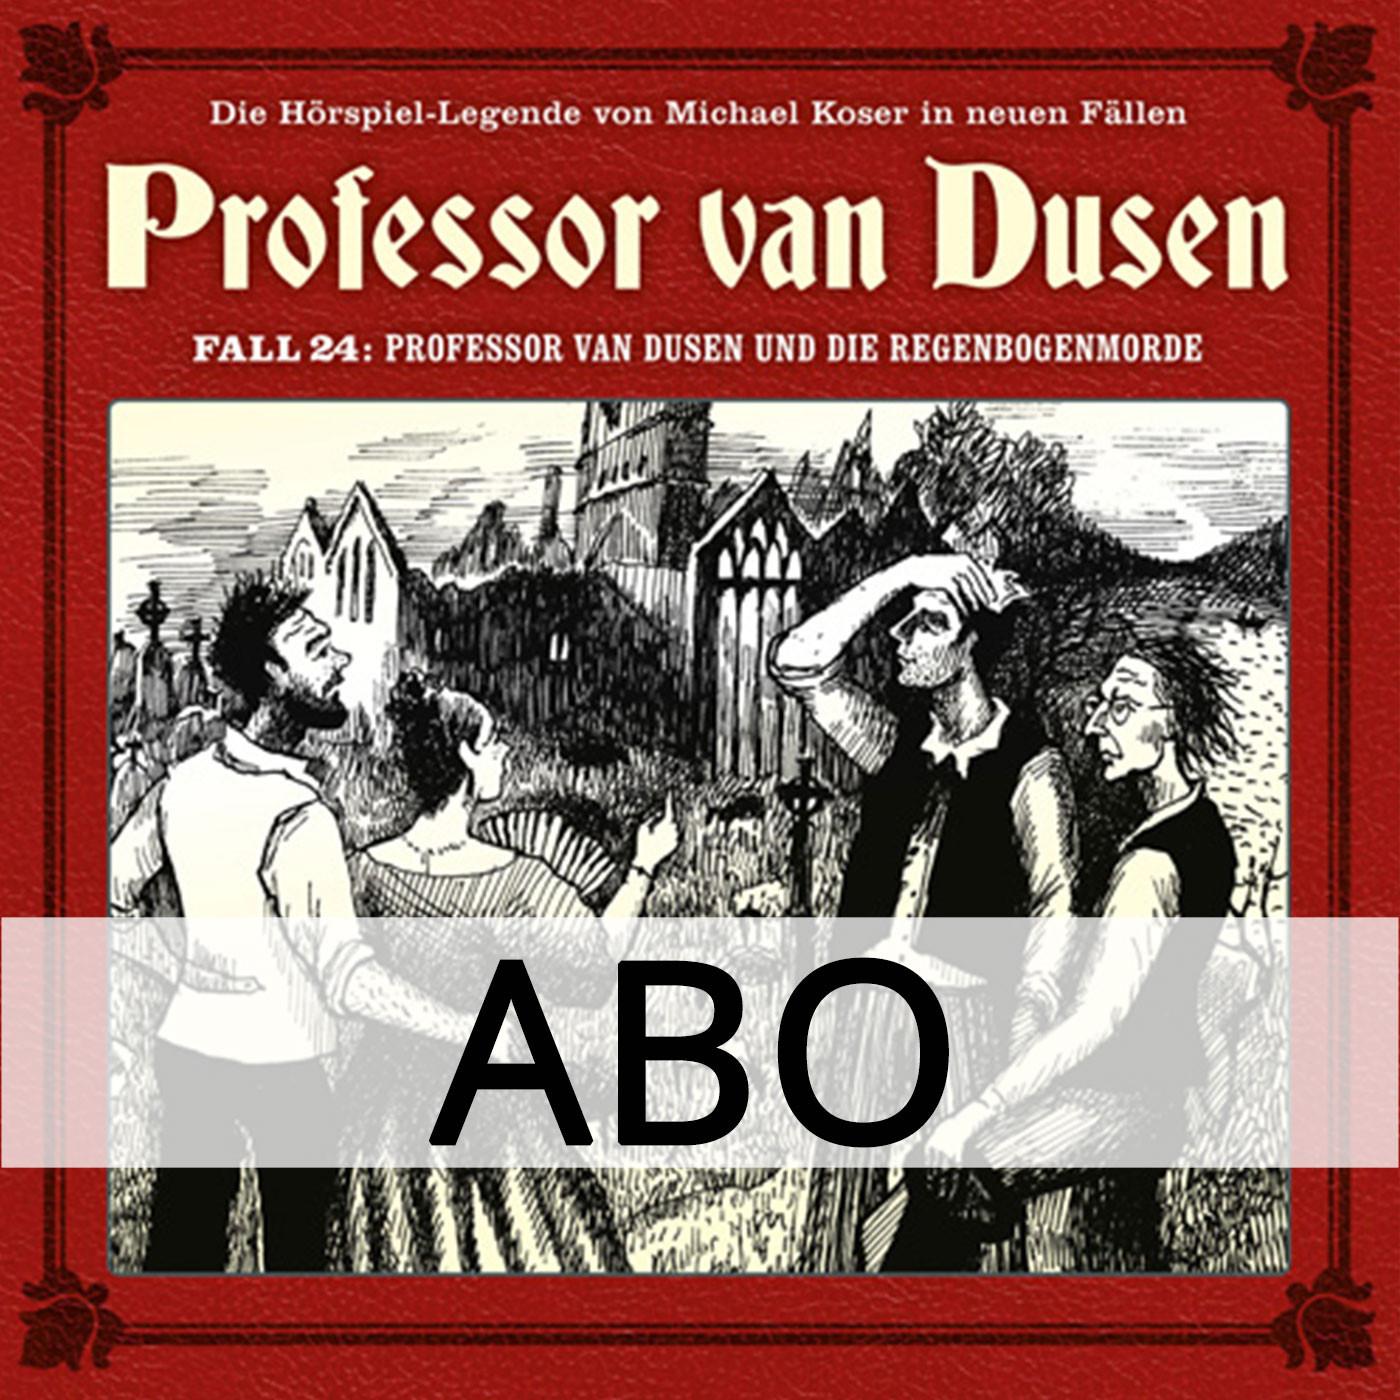 ABO Professor van Dusen - Die neuen Fälle